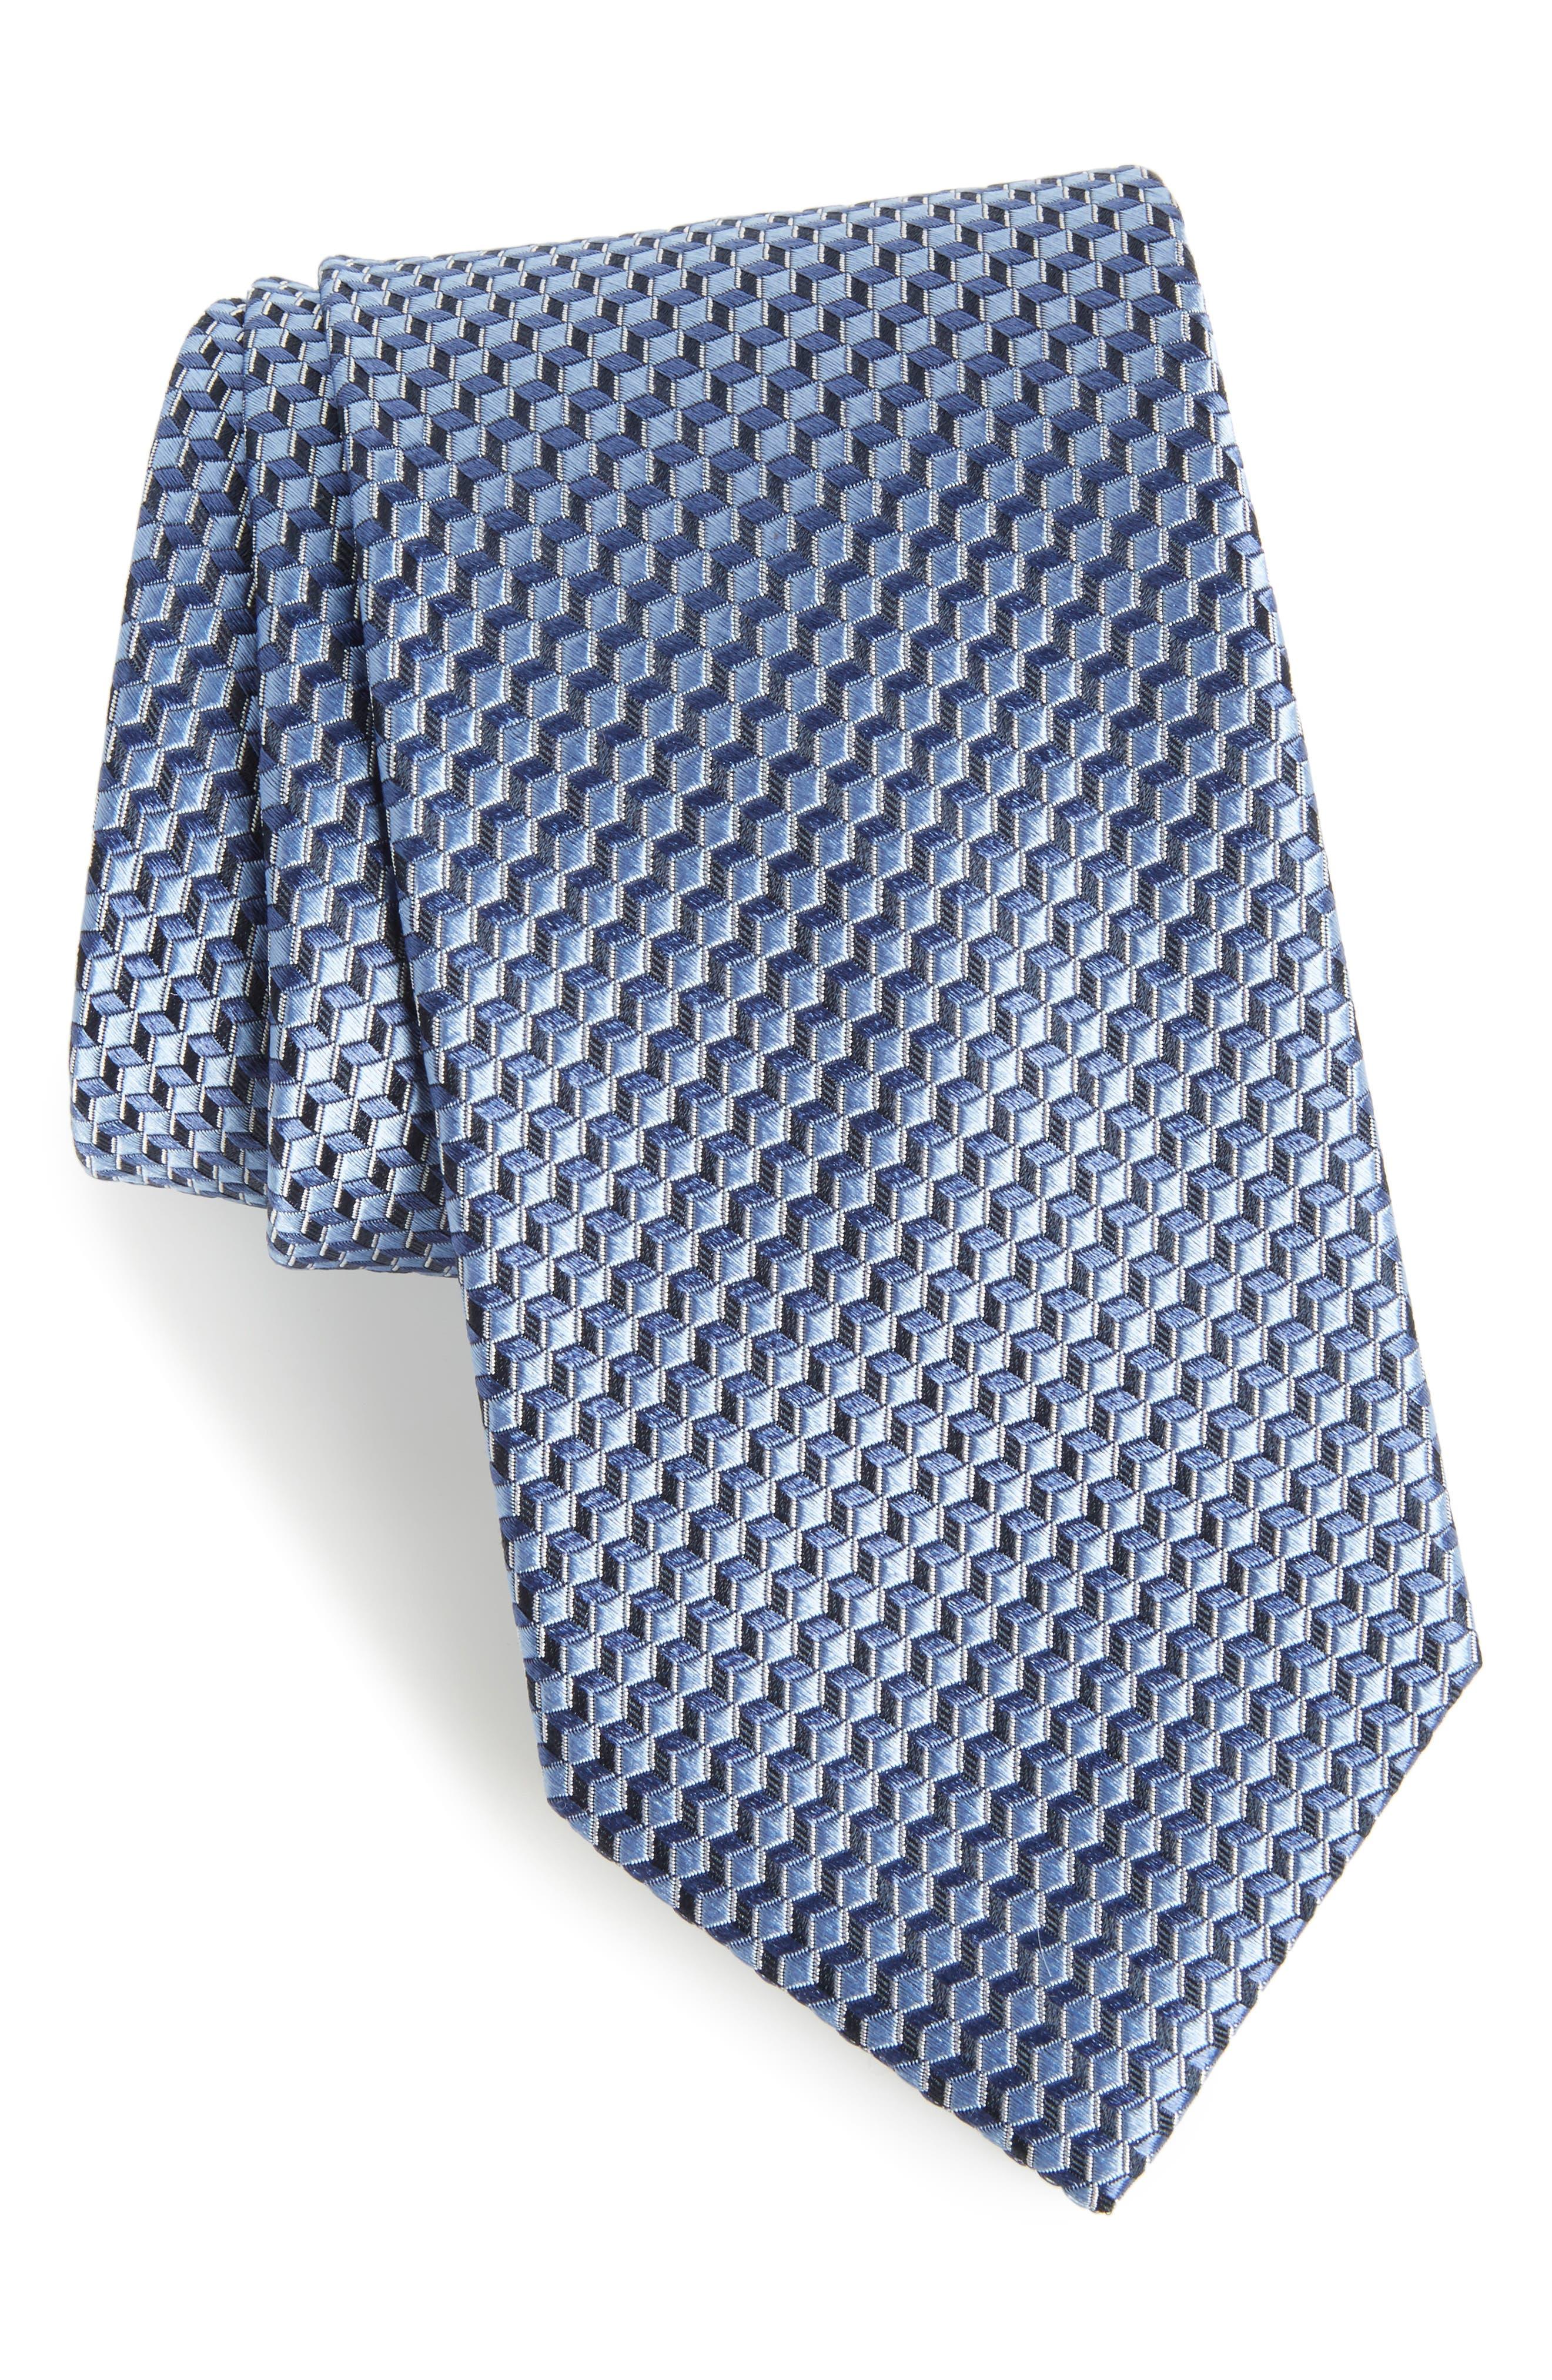 Main Image - Nordstrom Men's Shop Doria Geometric Silk Tie